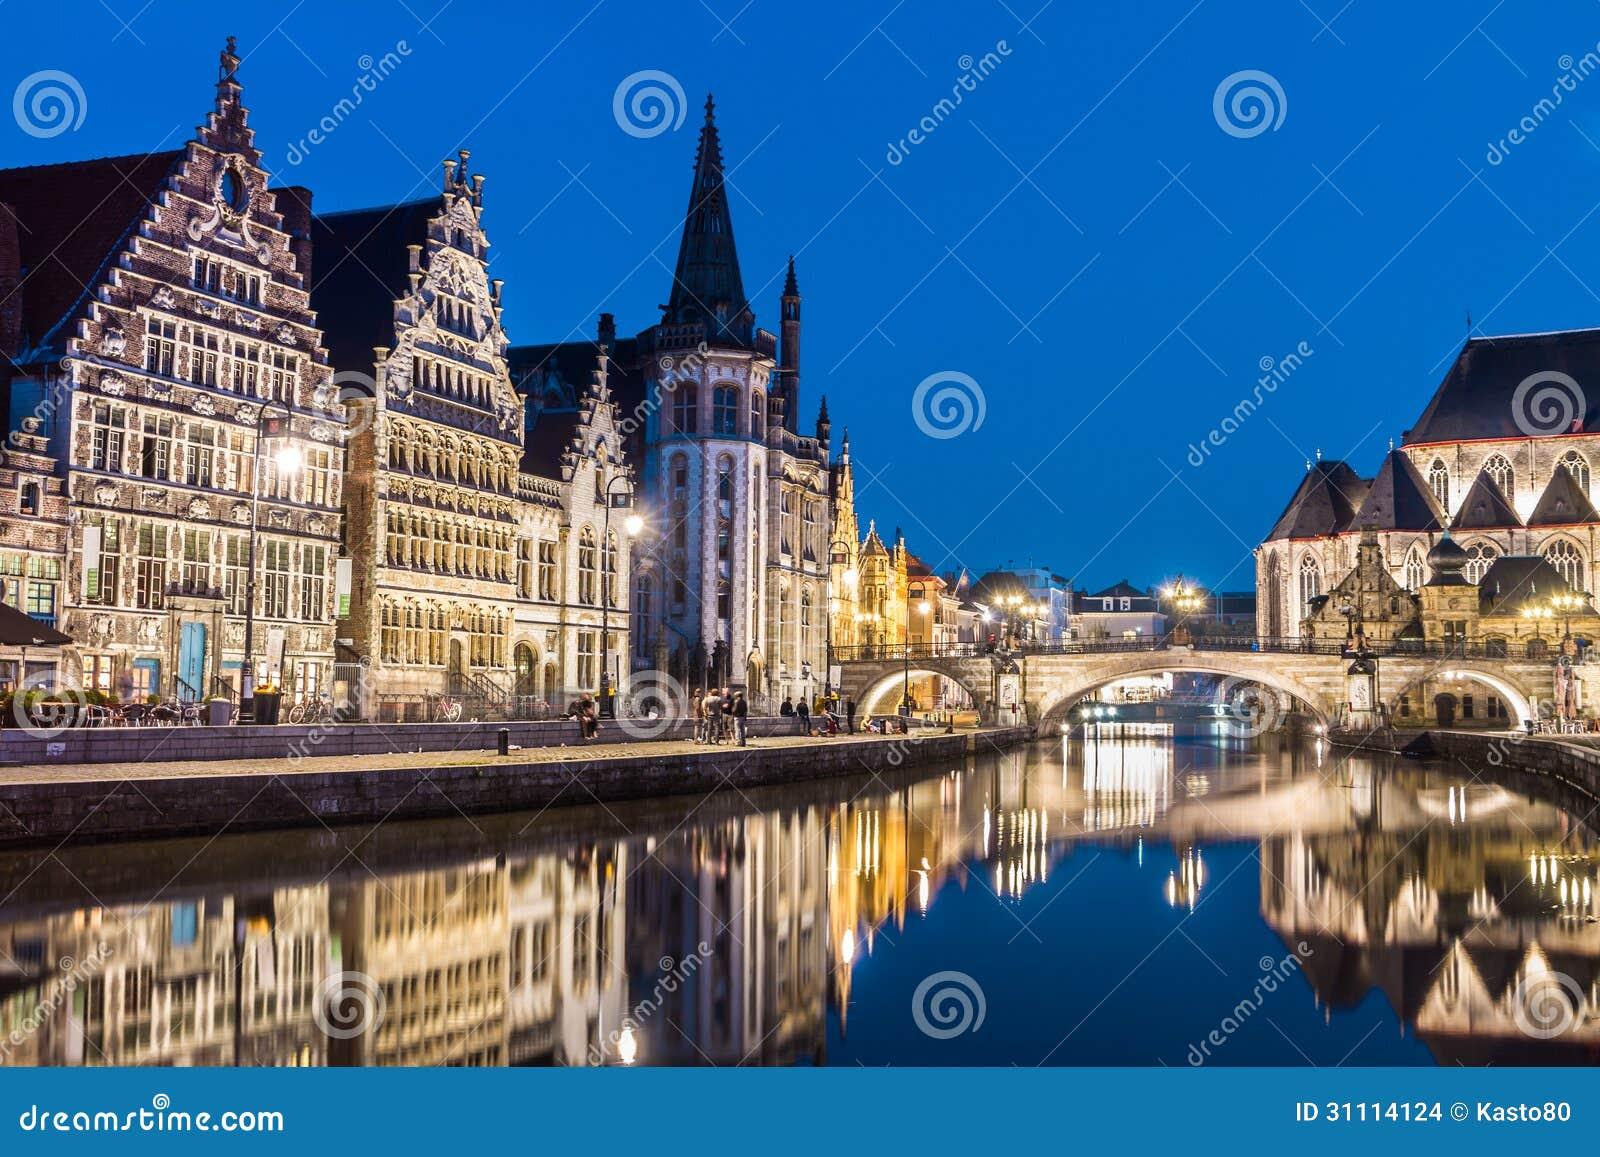 Leie river bank in Ghent, Belgium, Europe.